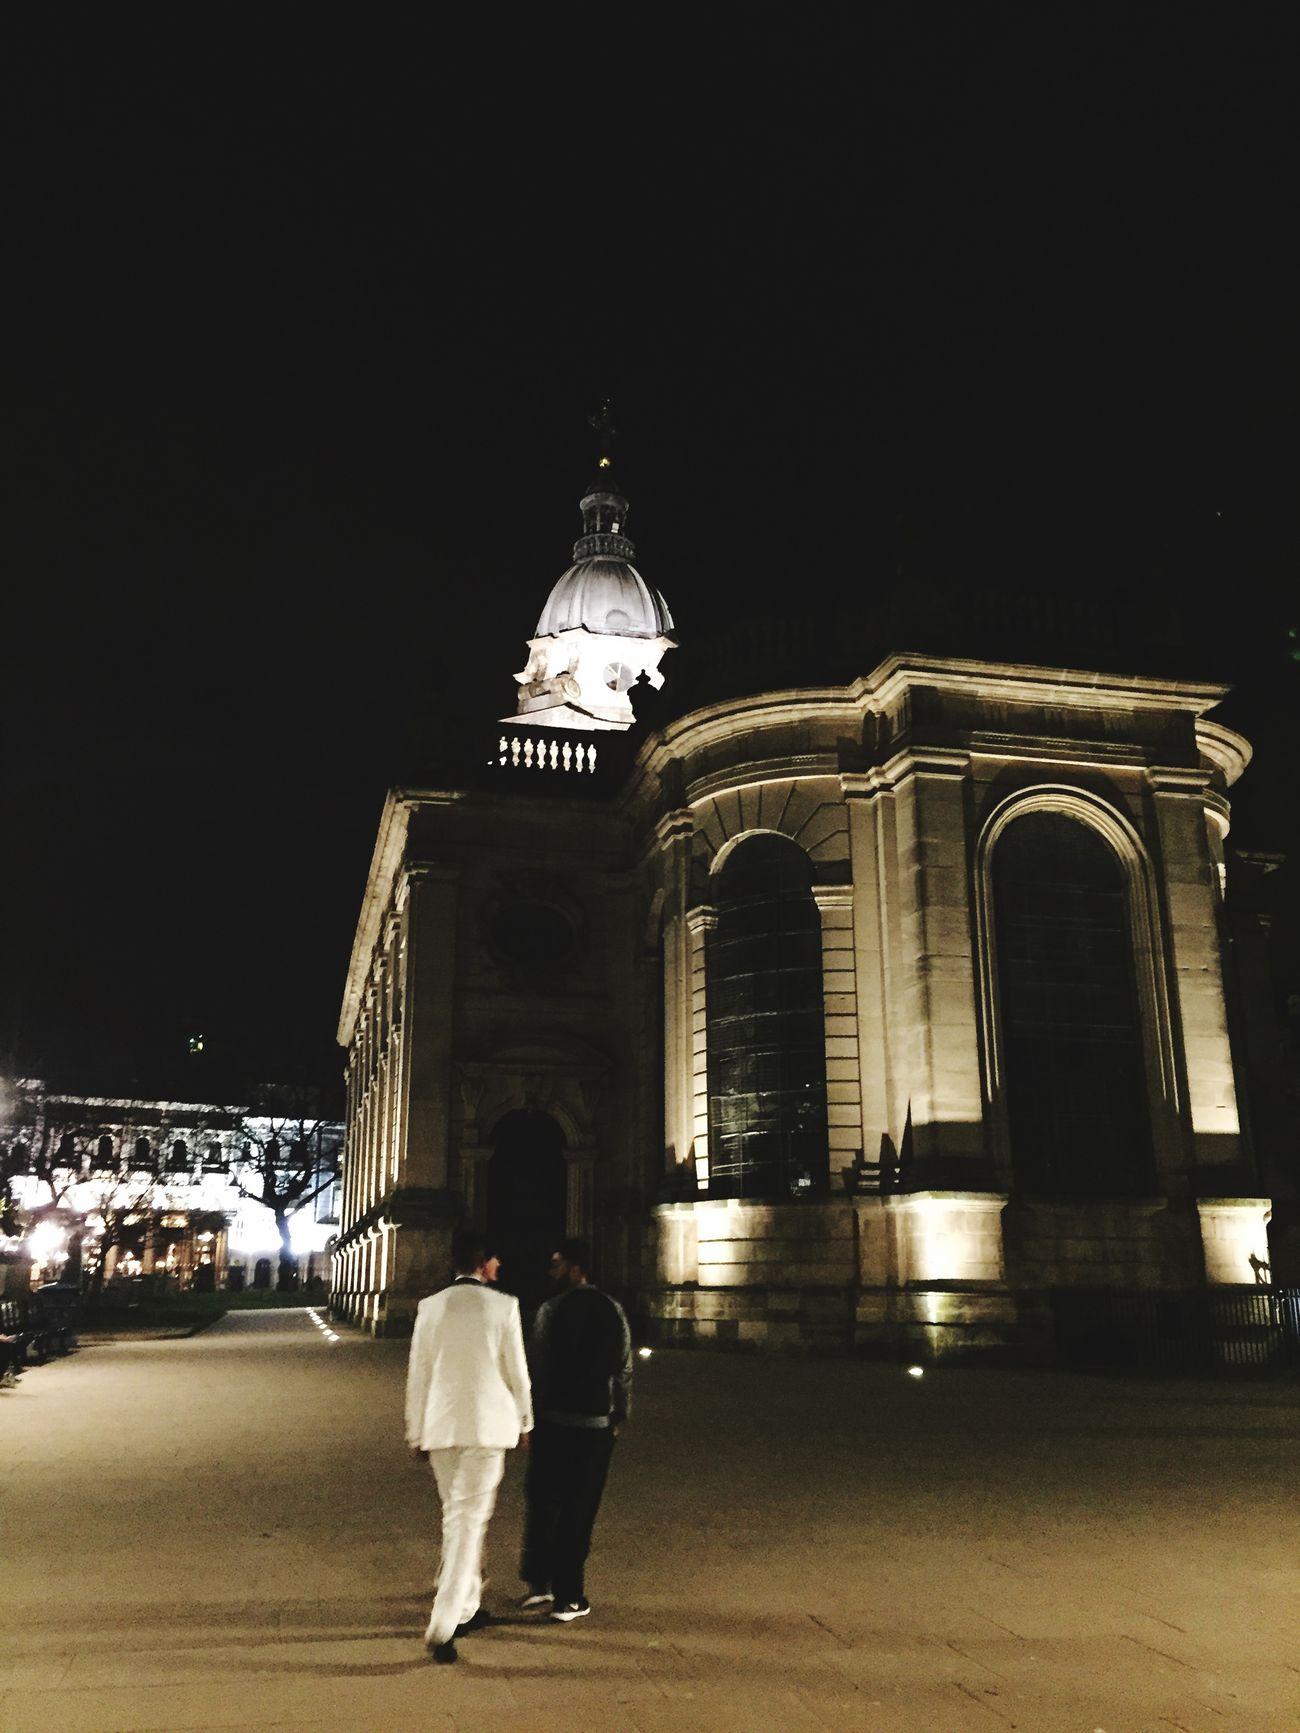 Birmingham nighttime